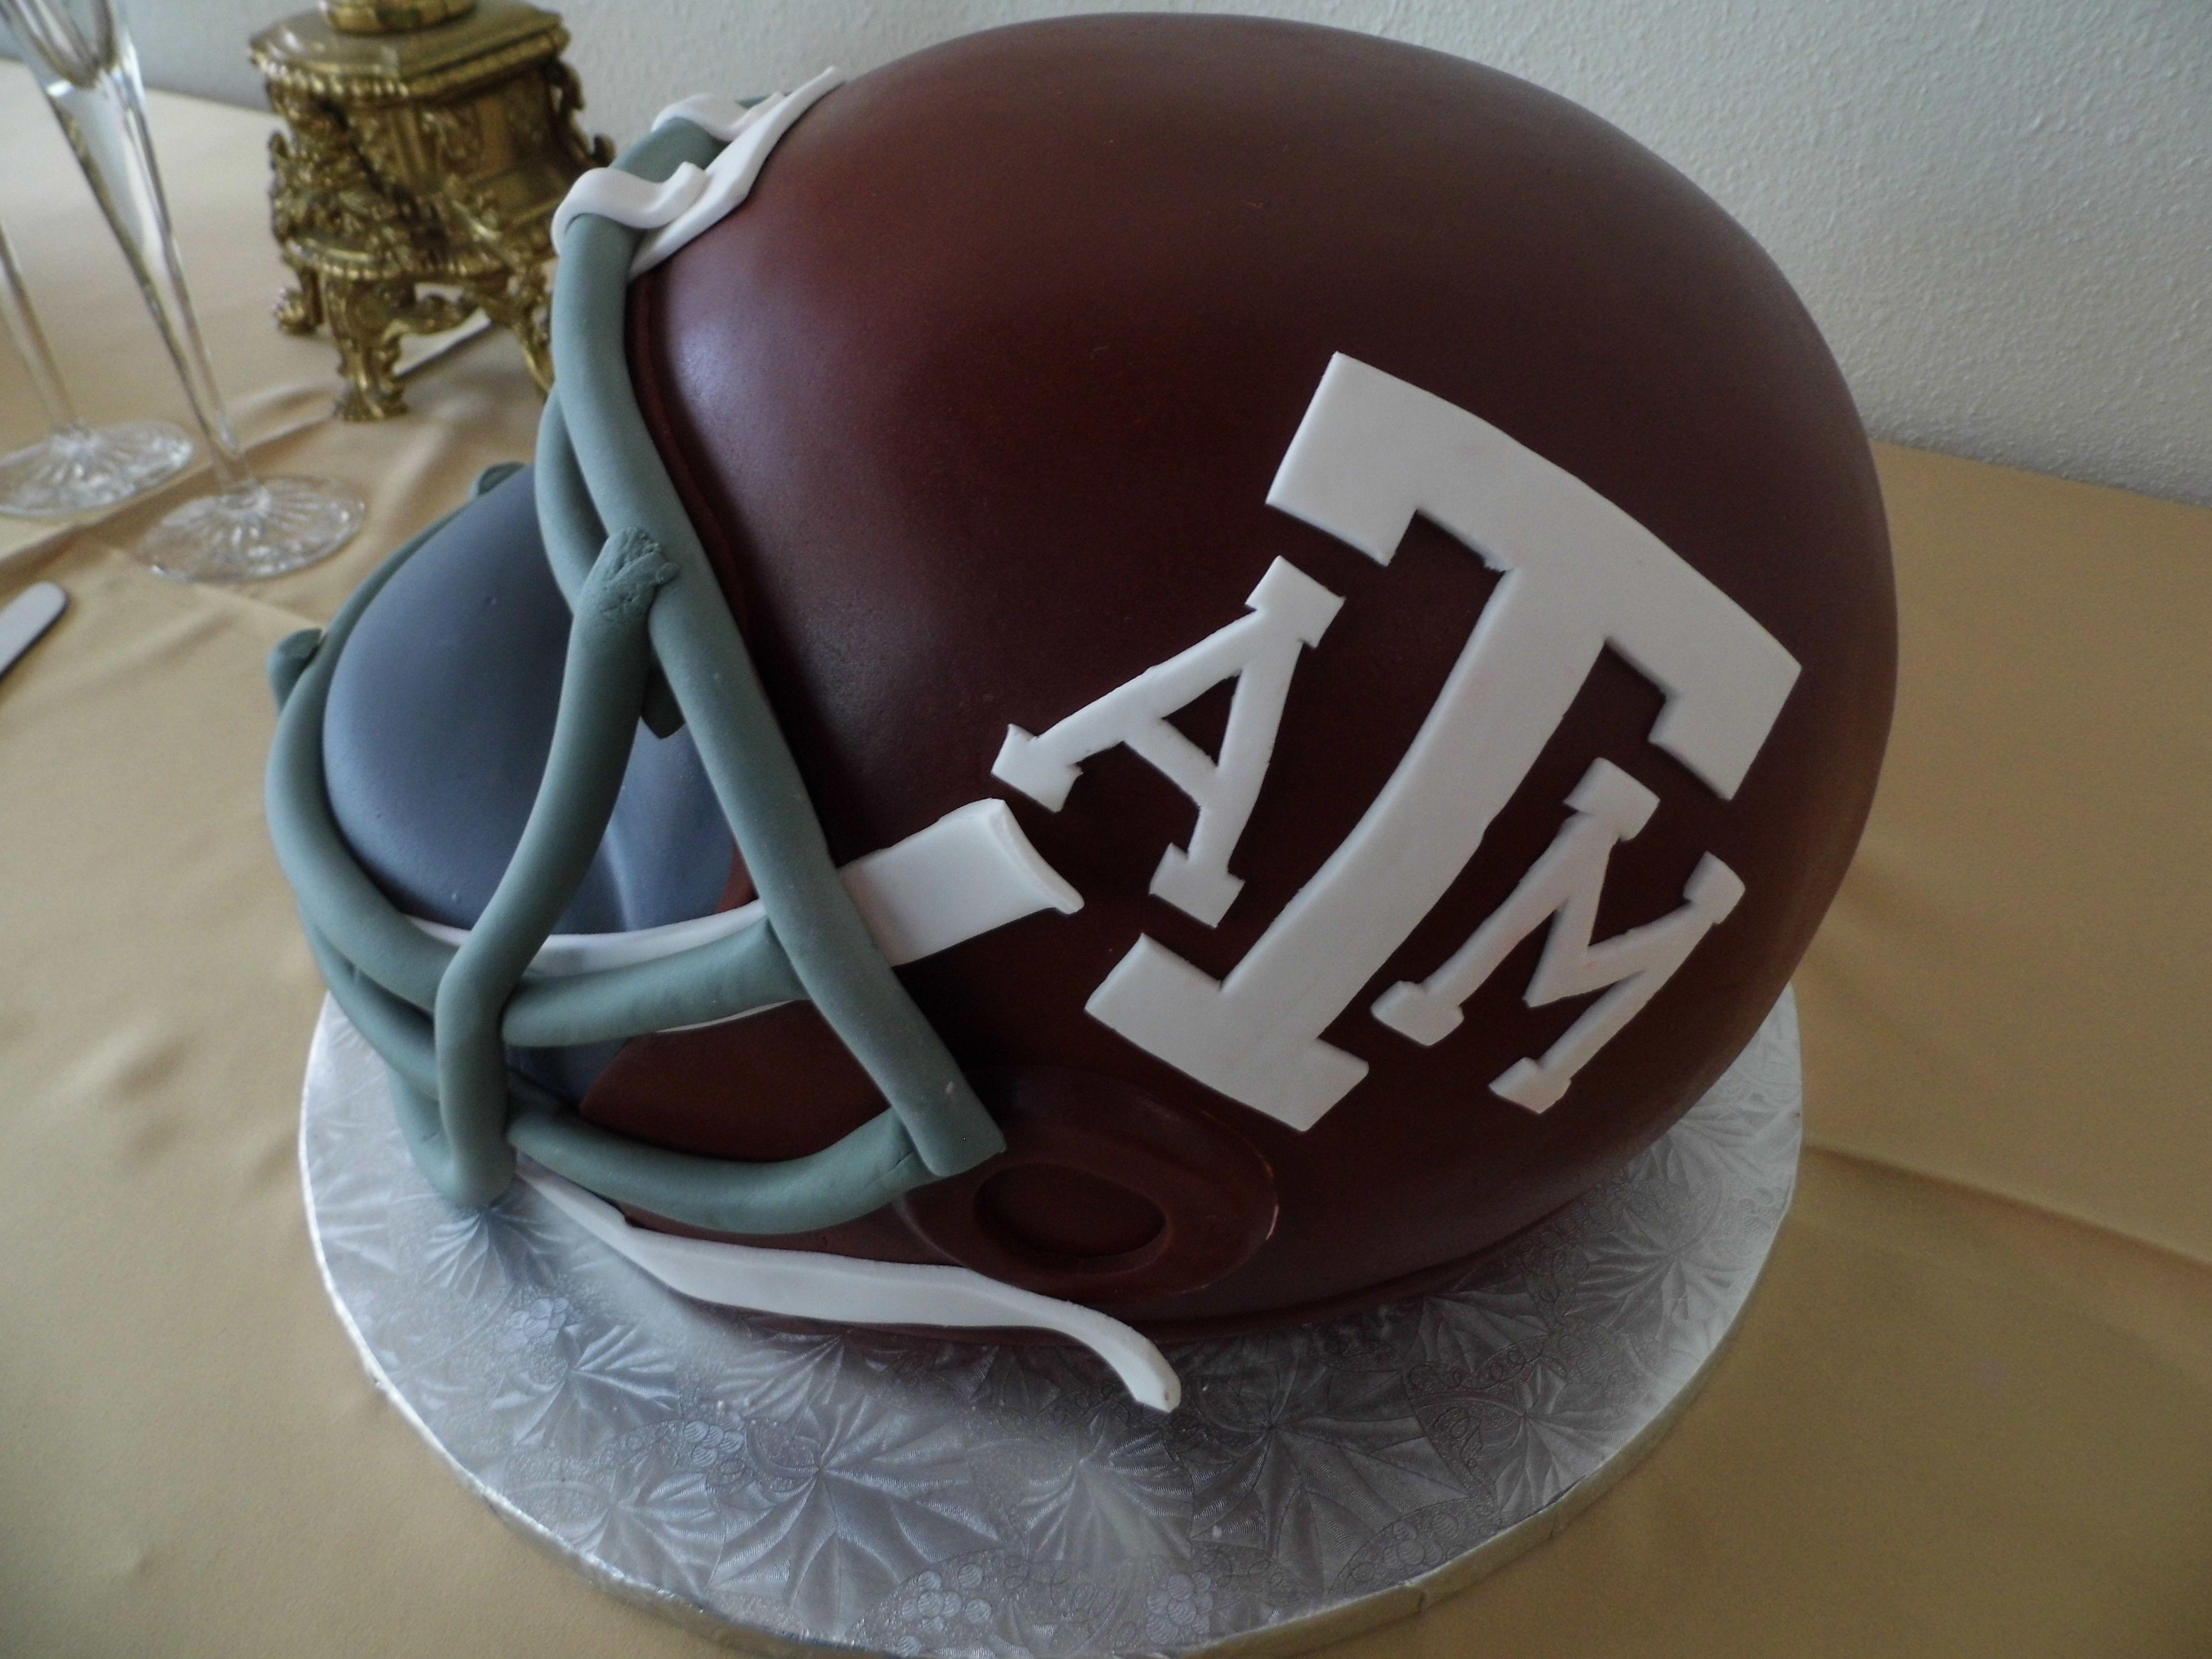 #Texas A & M #cake! Go Aggies! #12thMan #TAMU  http://www.sweettreetsbakery.com/